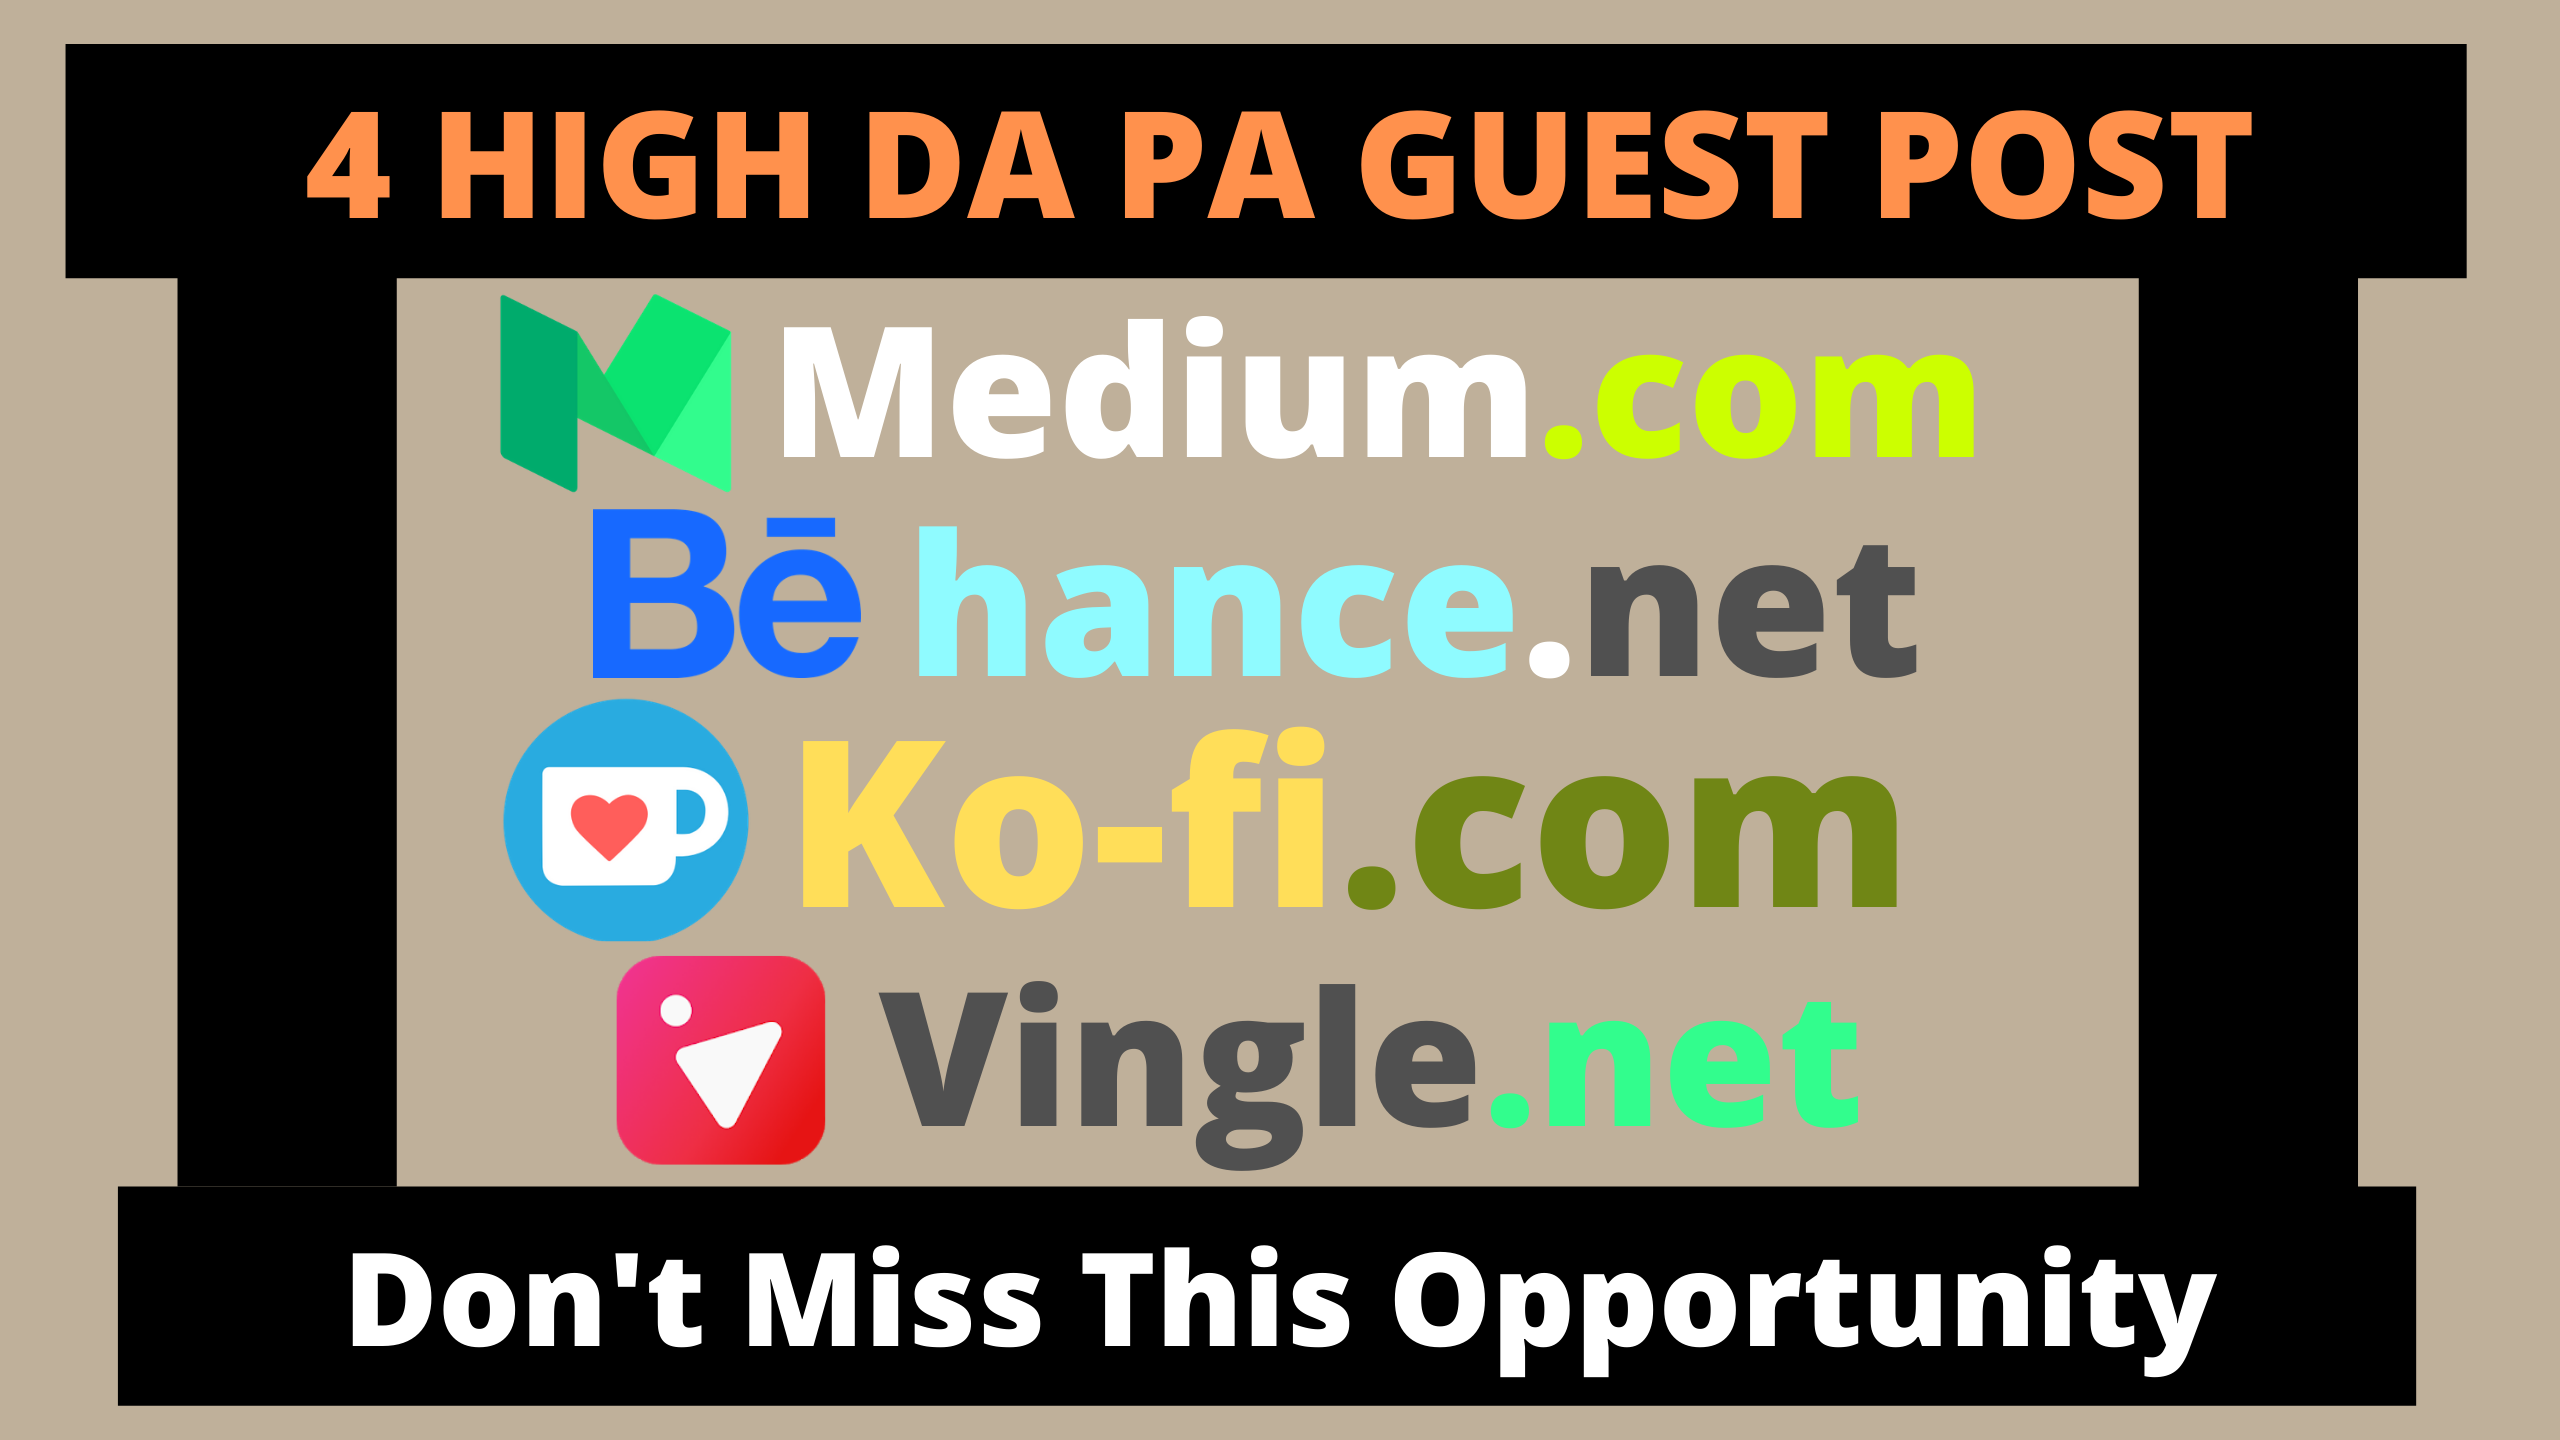 Publish 4 Guest Post On Medium,  Behance,  Ko-fi,  Vingle With Permanent Backlinks